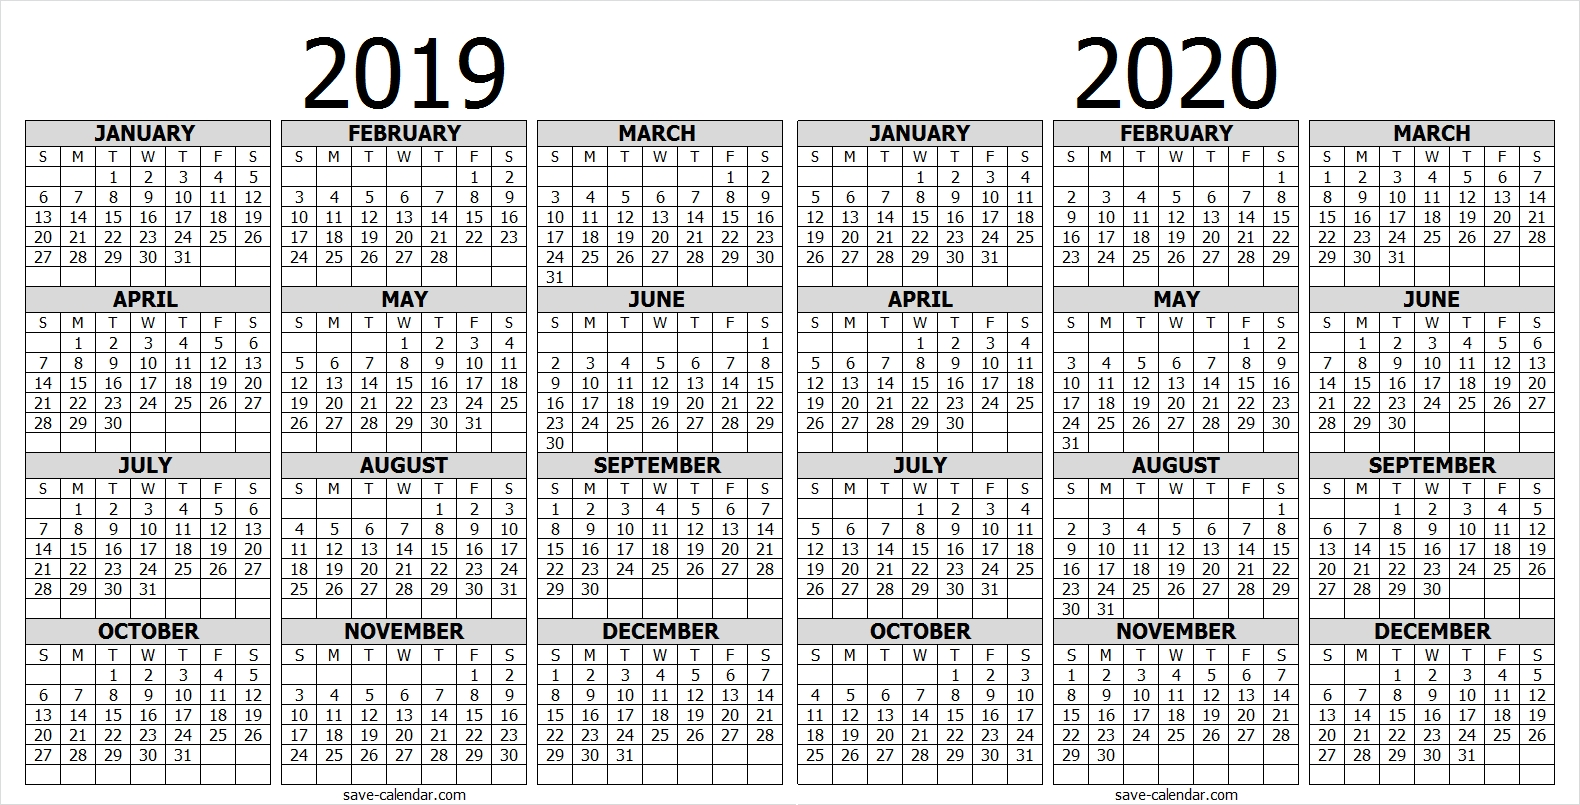 Calendar 2019 2020 One Page | 2019 Calendar | Free Calendar pertaining to Free Printable Calendars 2019-2020 To Edit